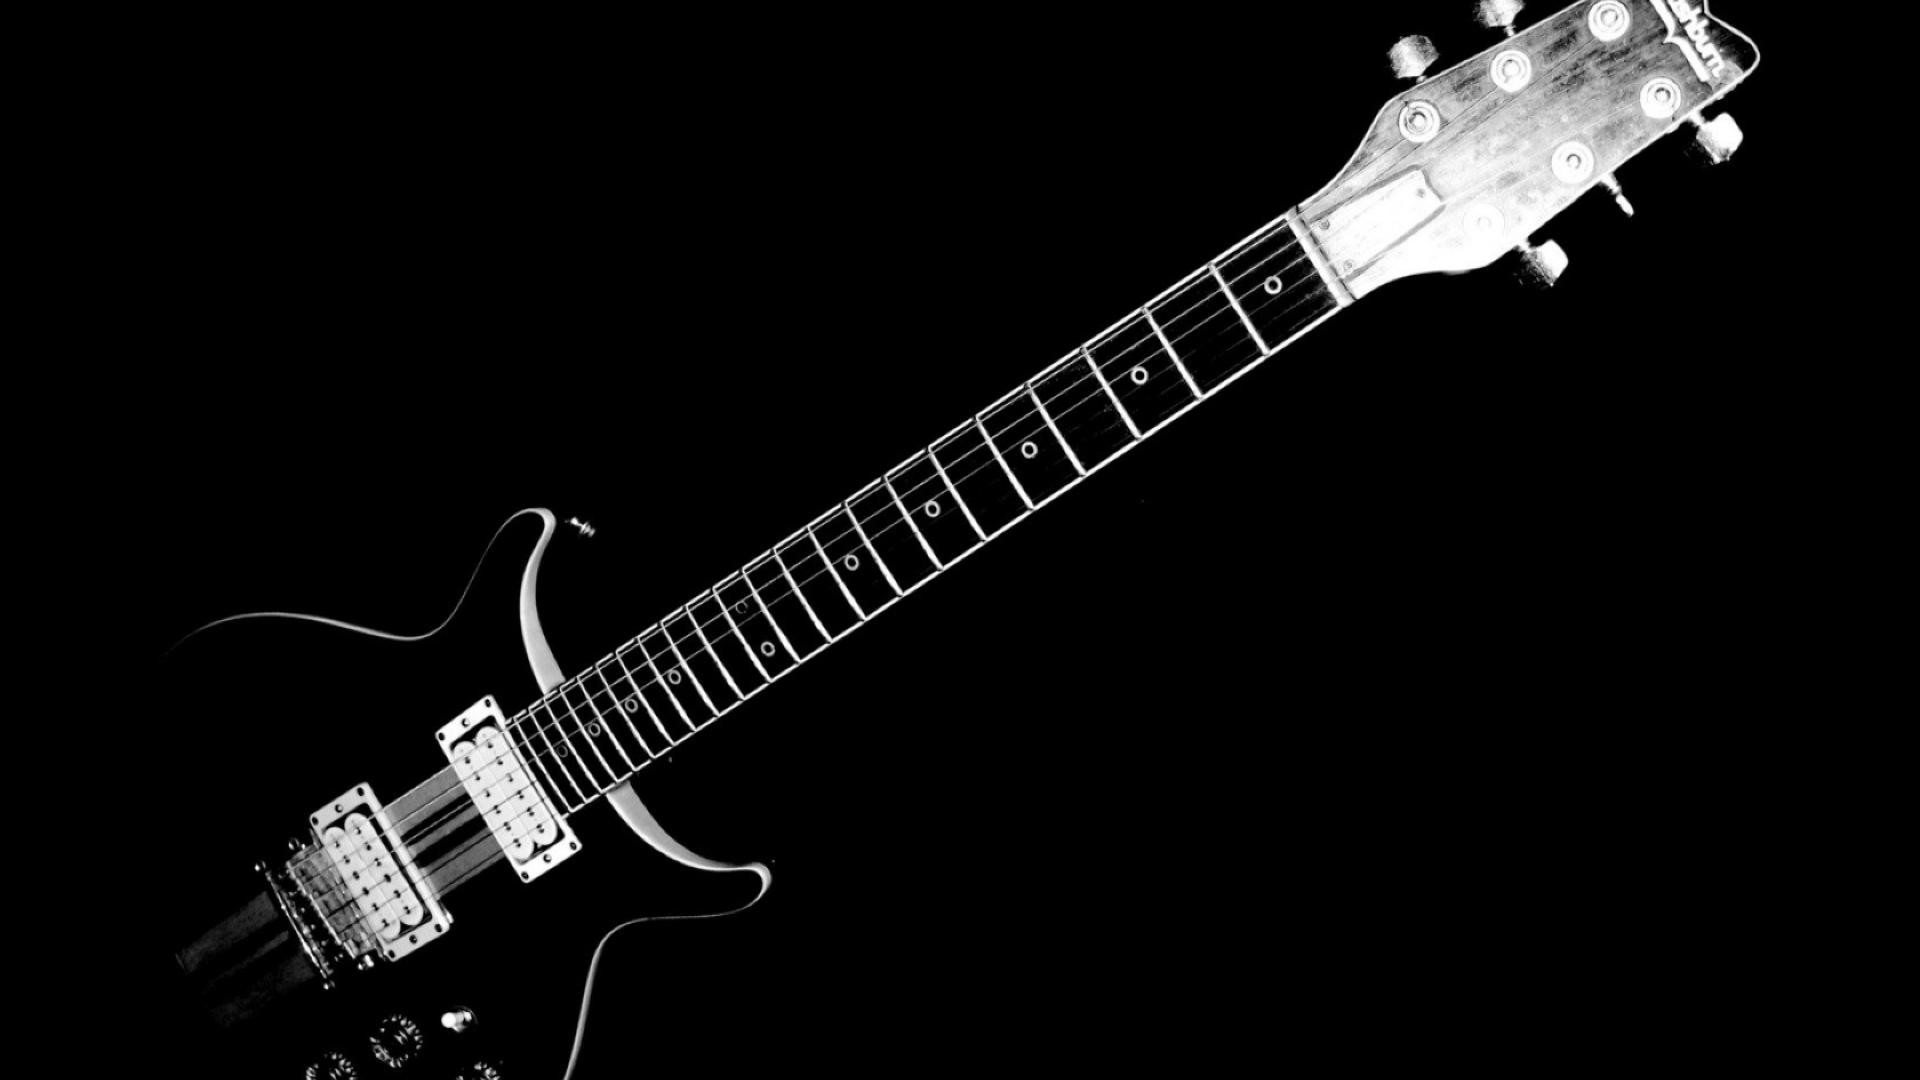 Gibson Guitar Wallpaper Hd 54 Images